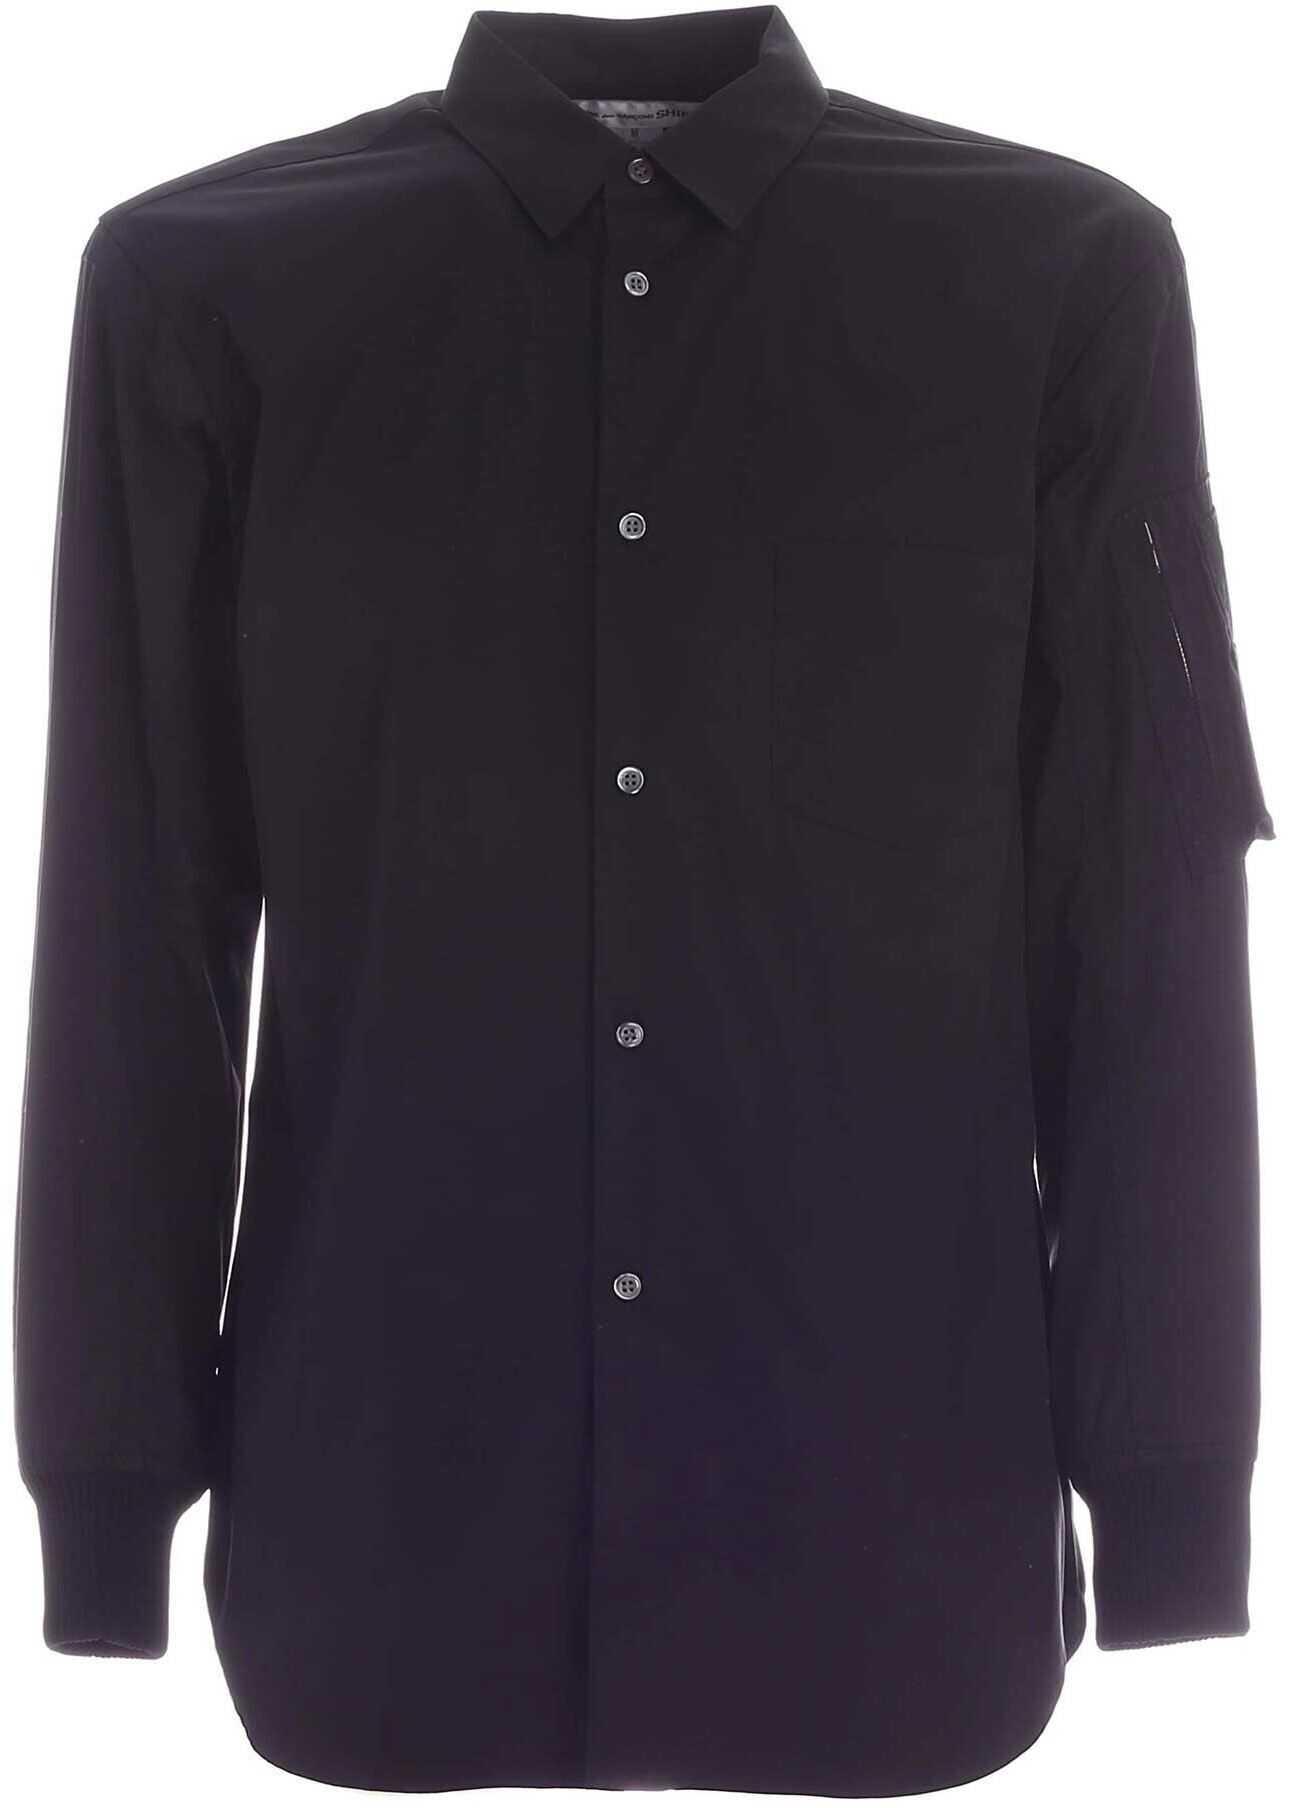 Comme des Garçons Knitted Cuffs Shirt In Black Black imagine